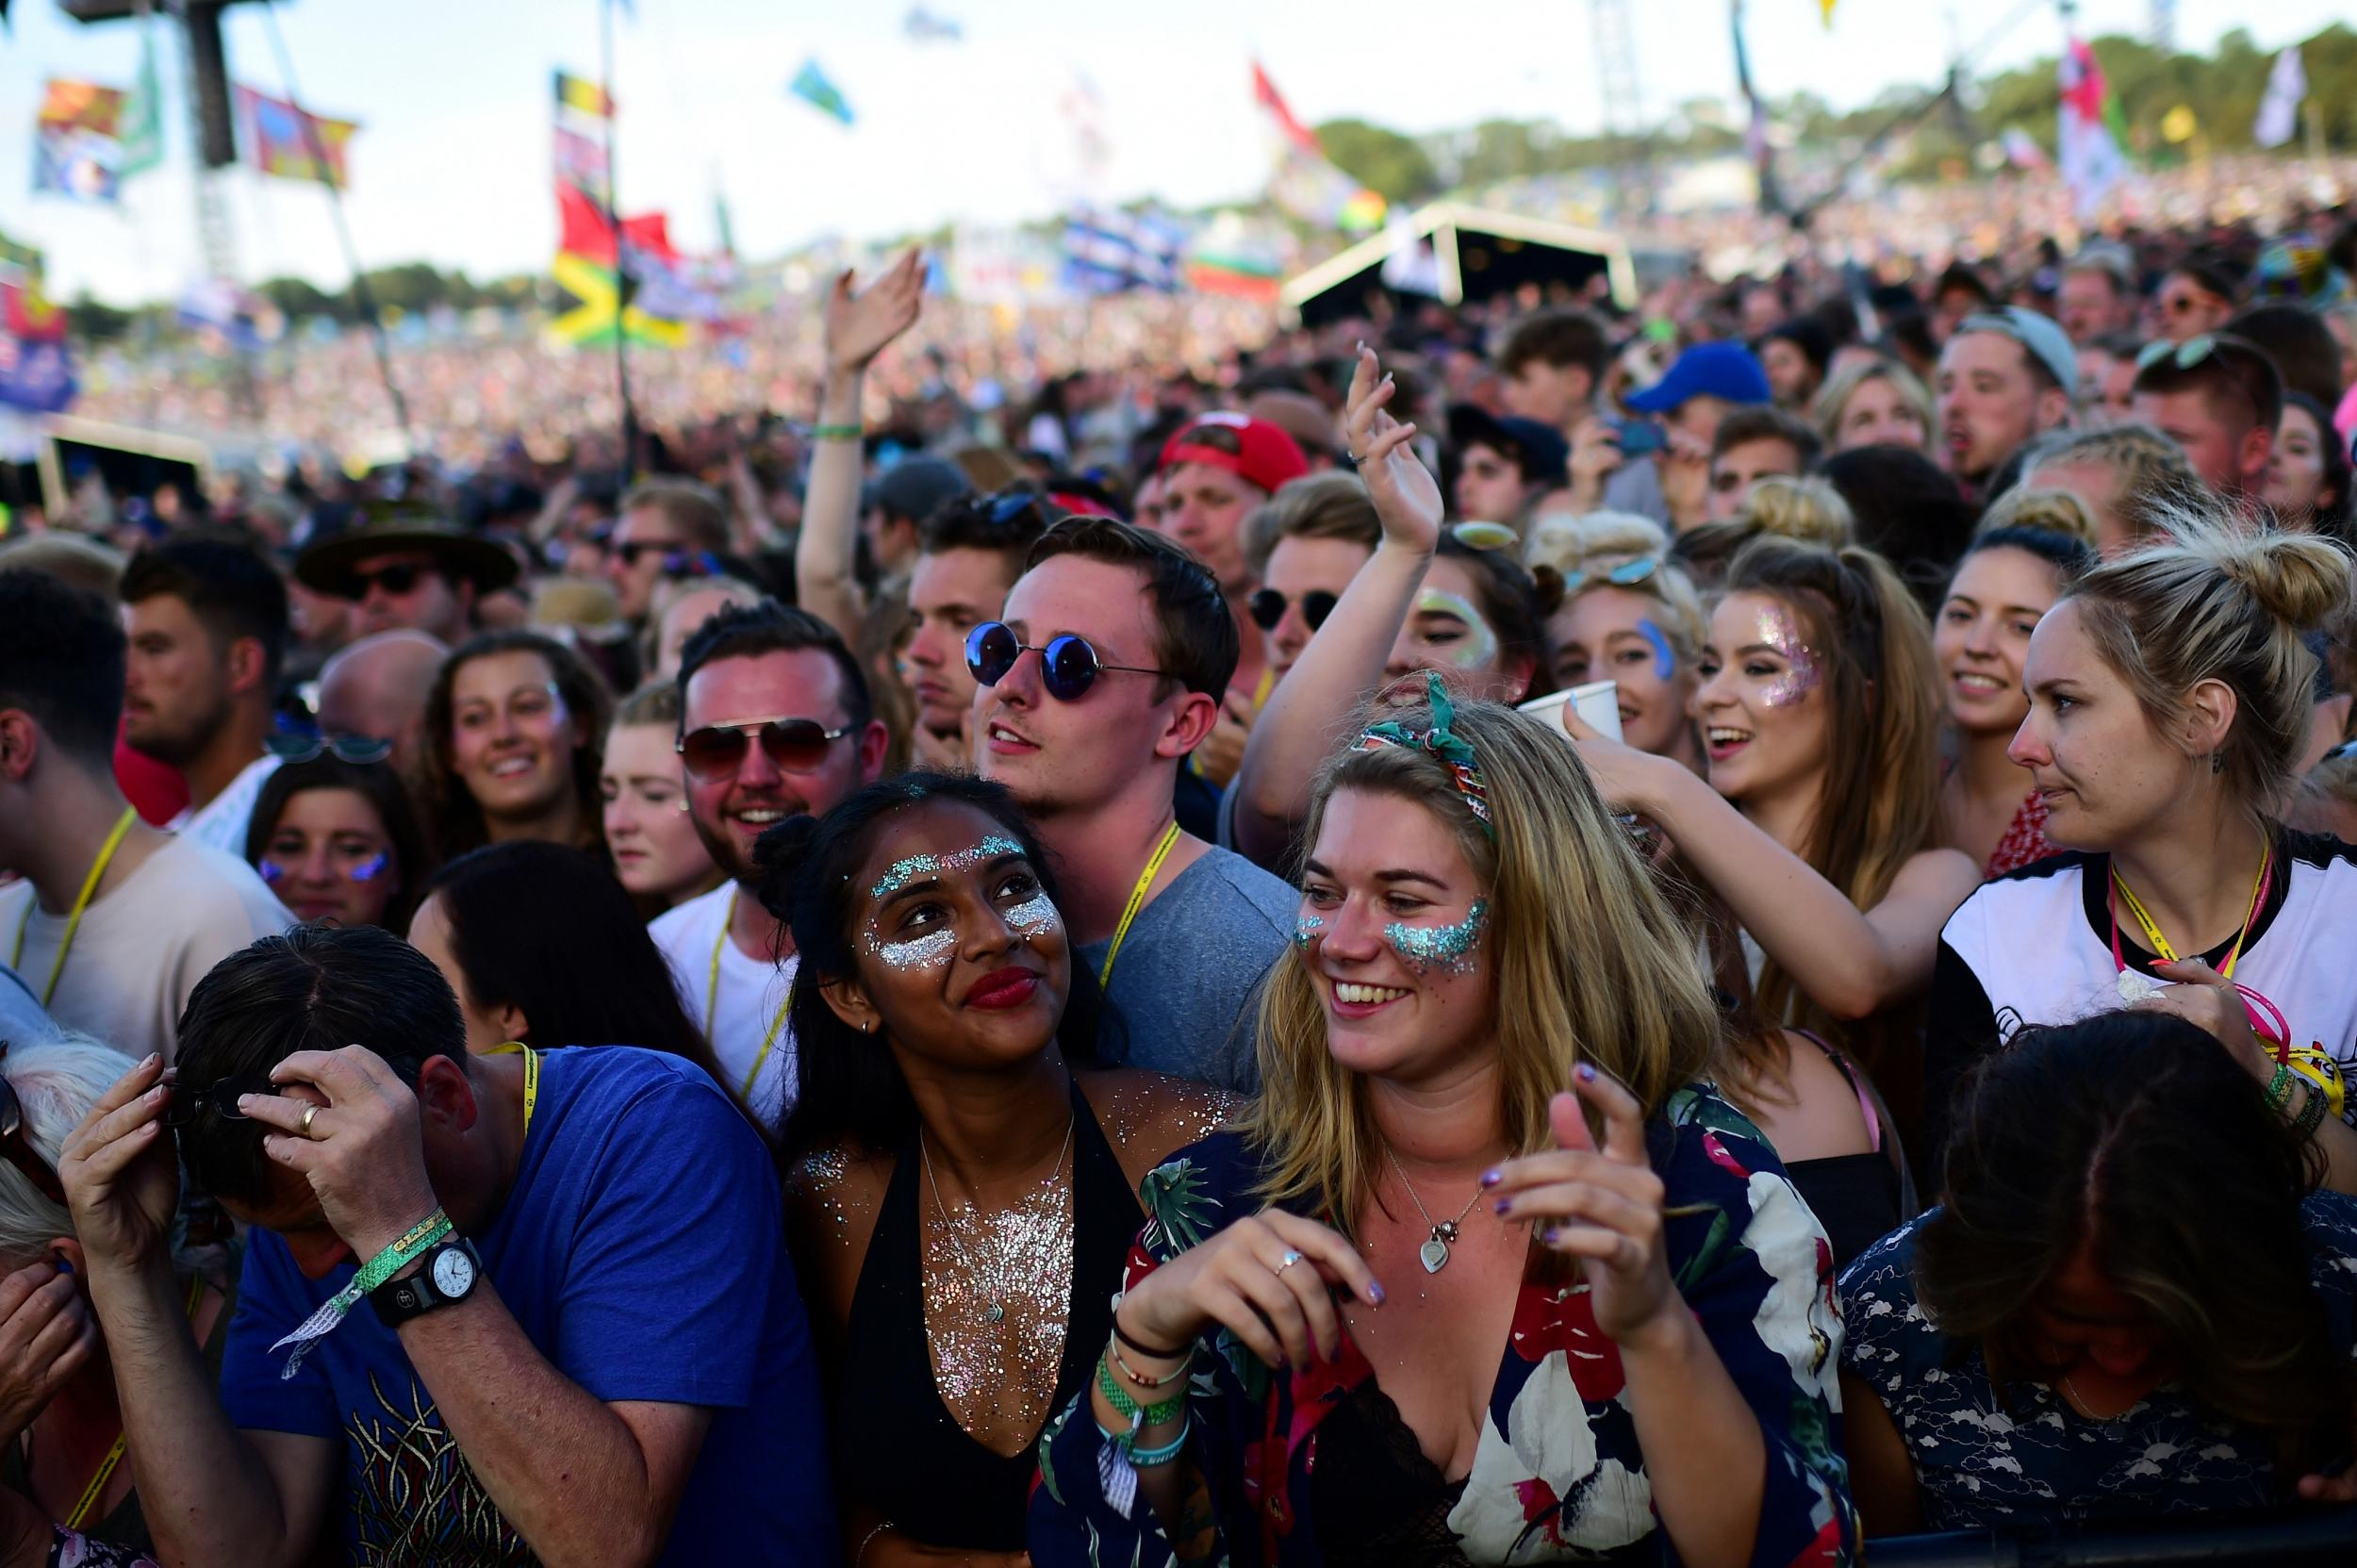 Festivals ask competition watchdog to investigate Live Nation over market dominance